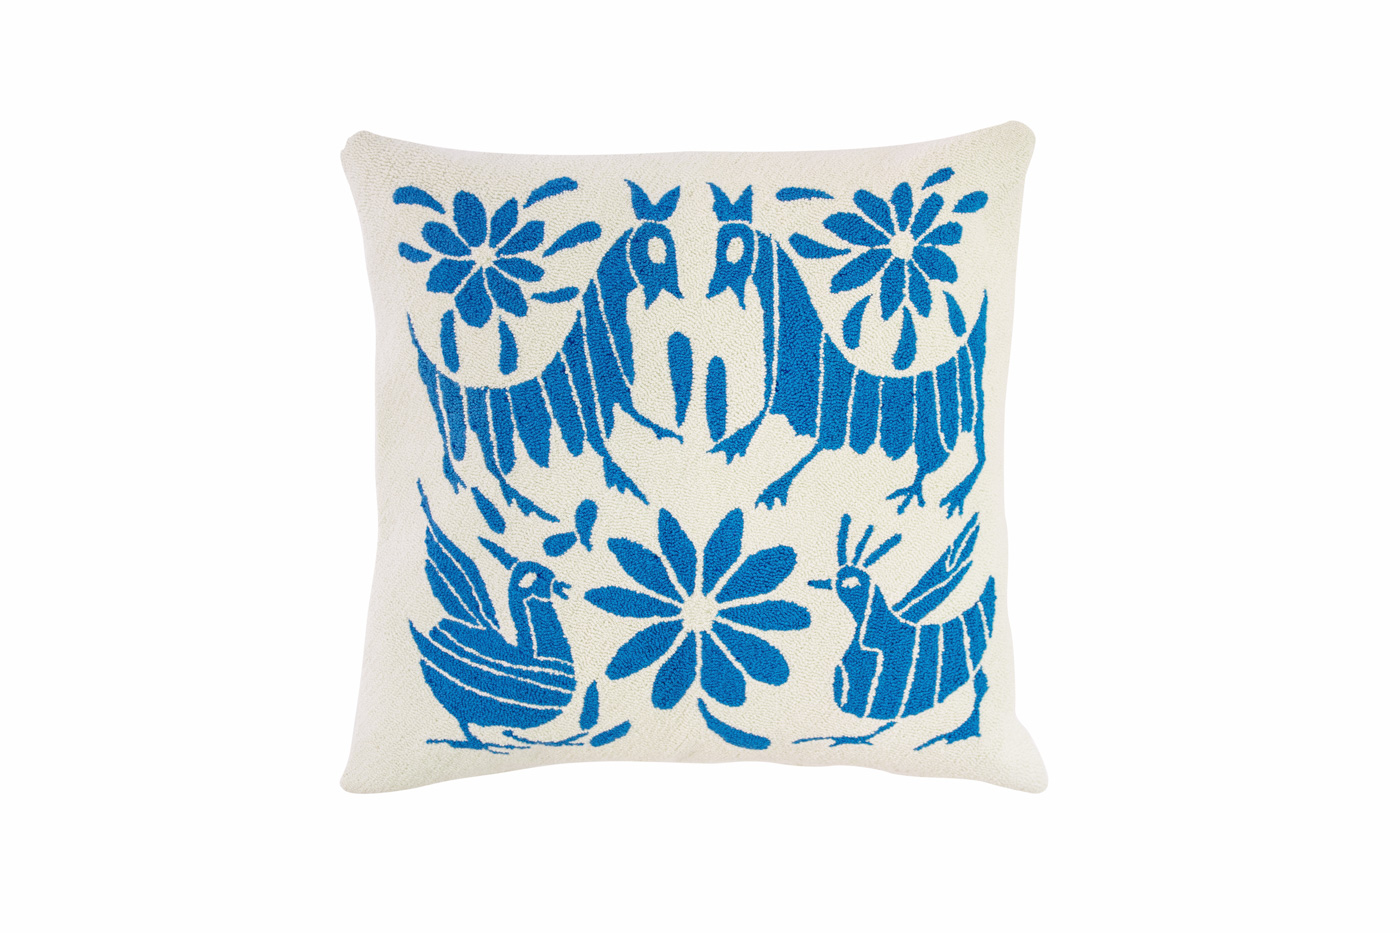 Puyao cushion Mexican birds blue